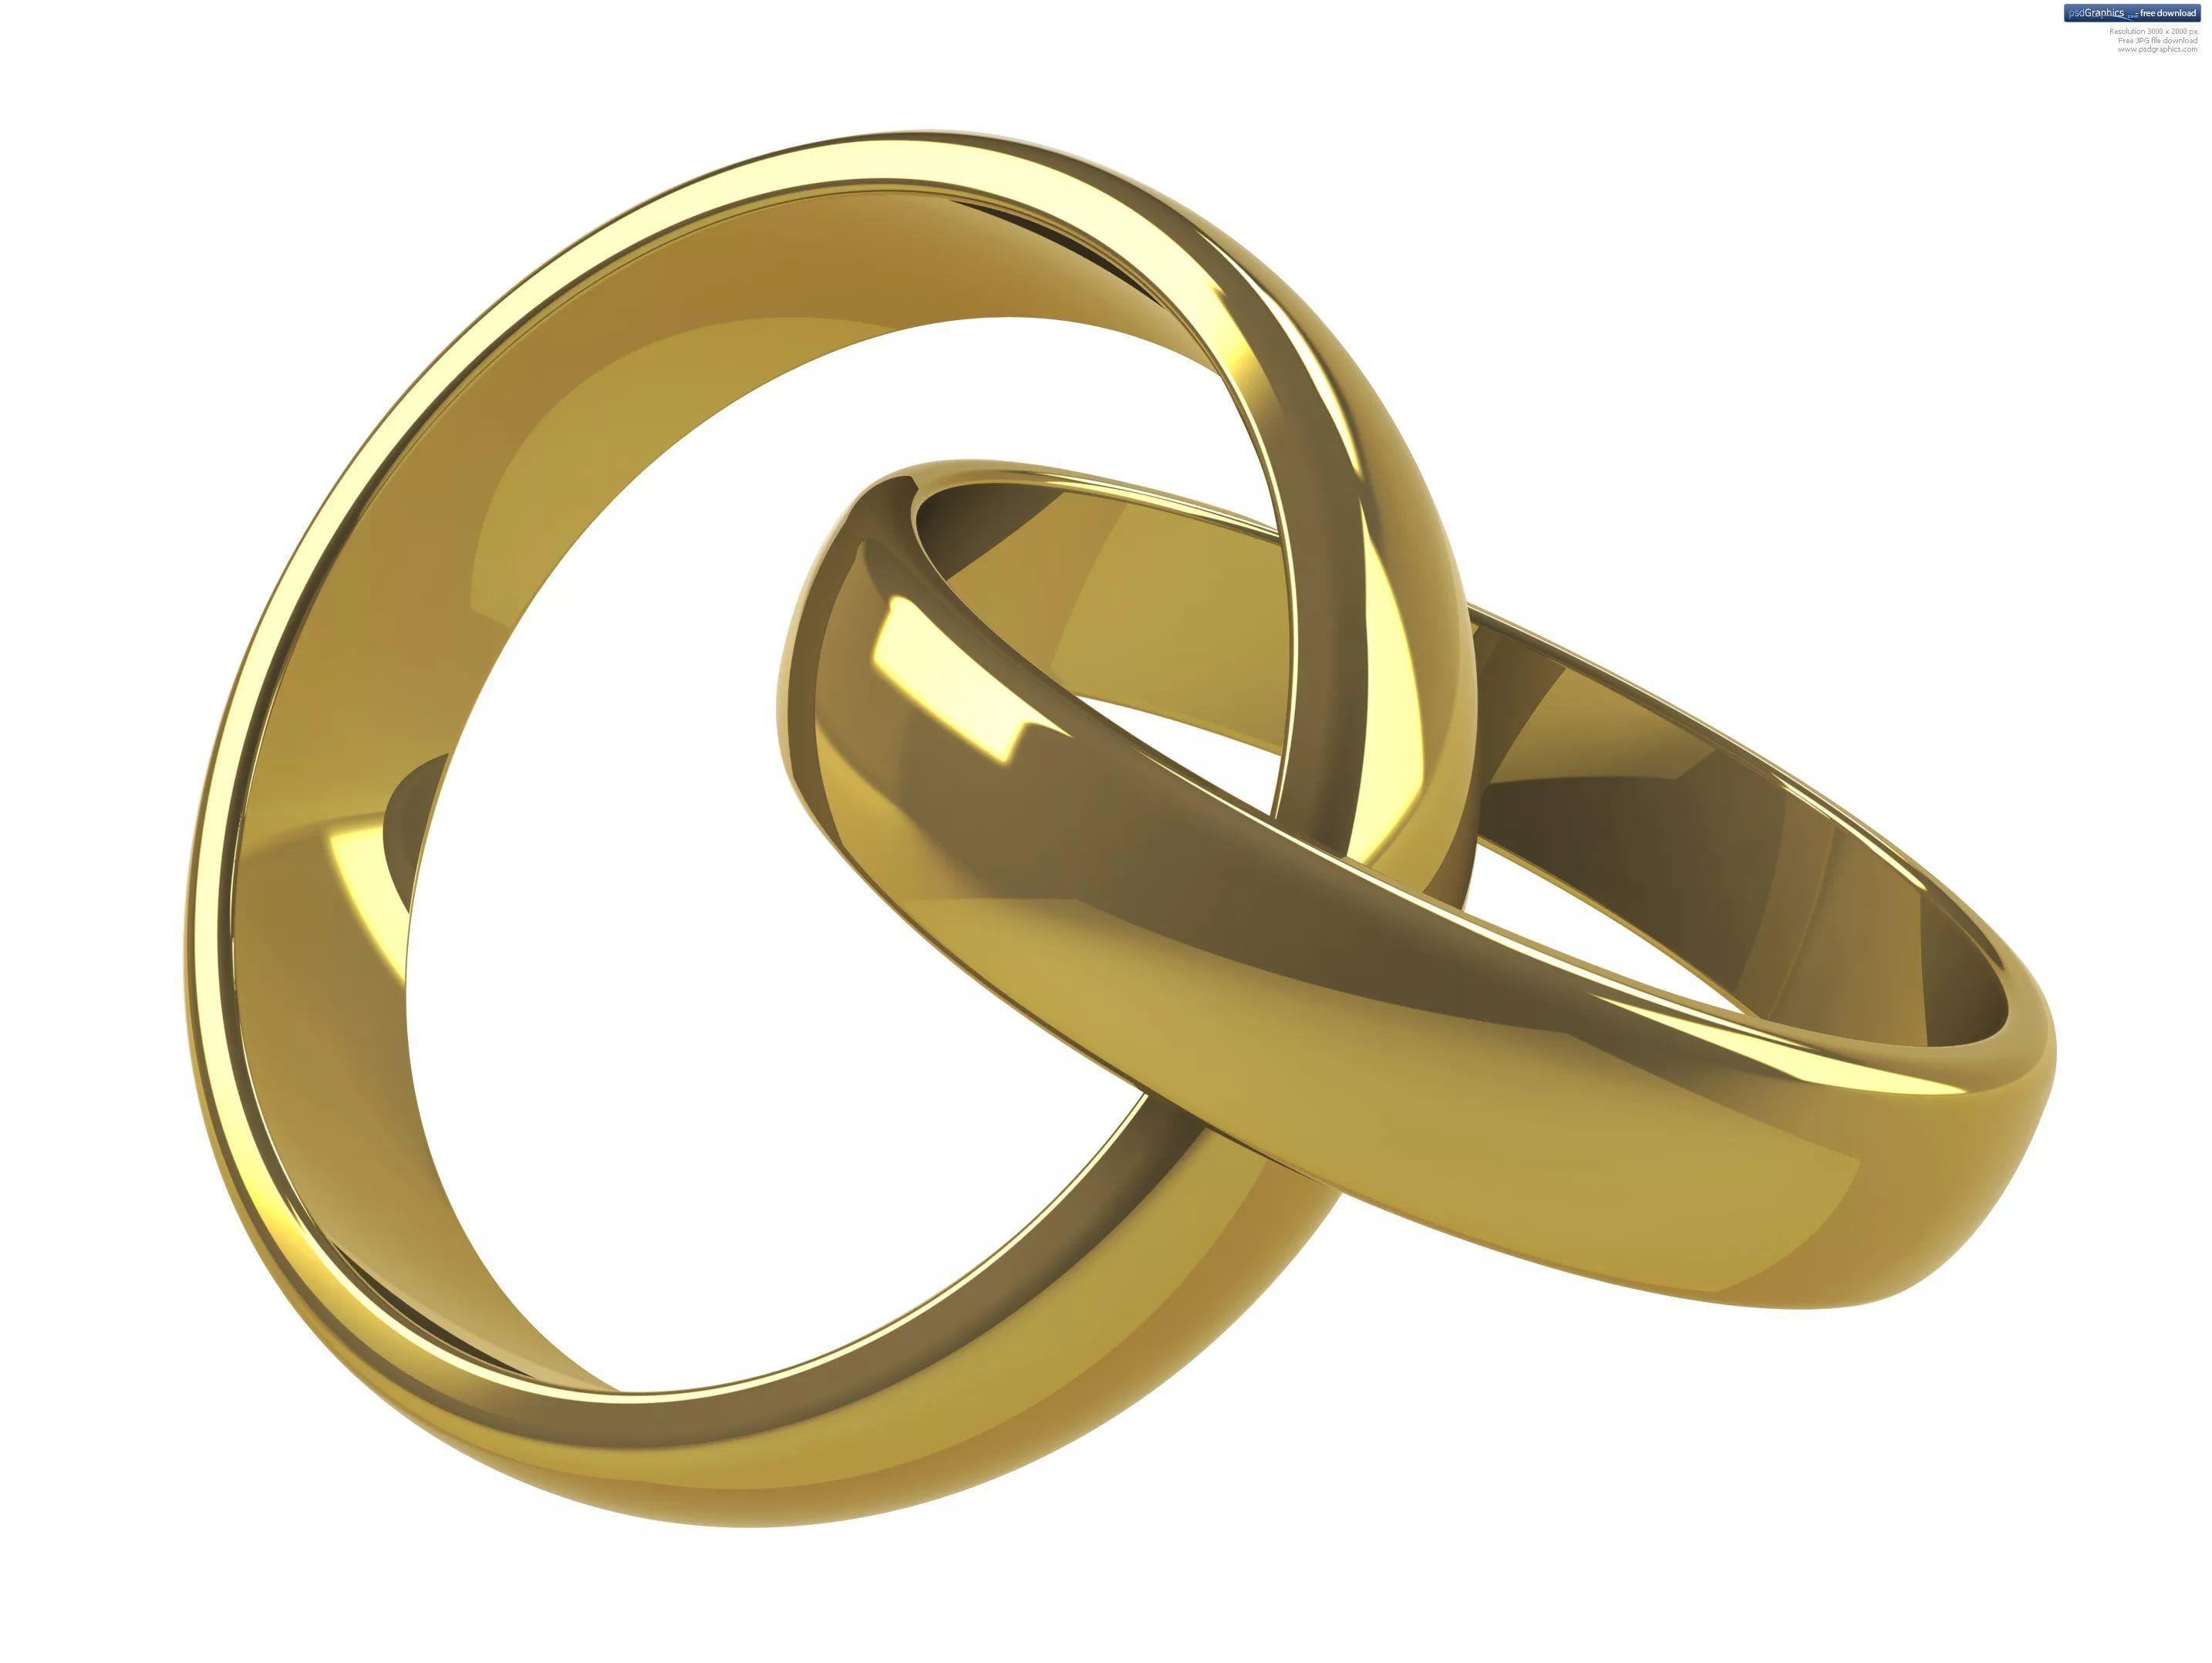 Аниме, картинки свадебные кольца на белом фоне